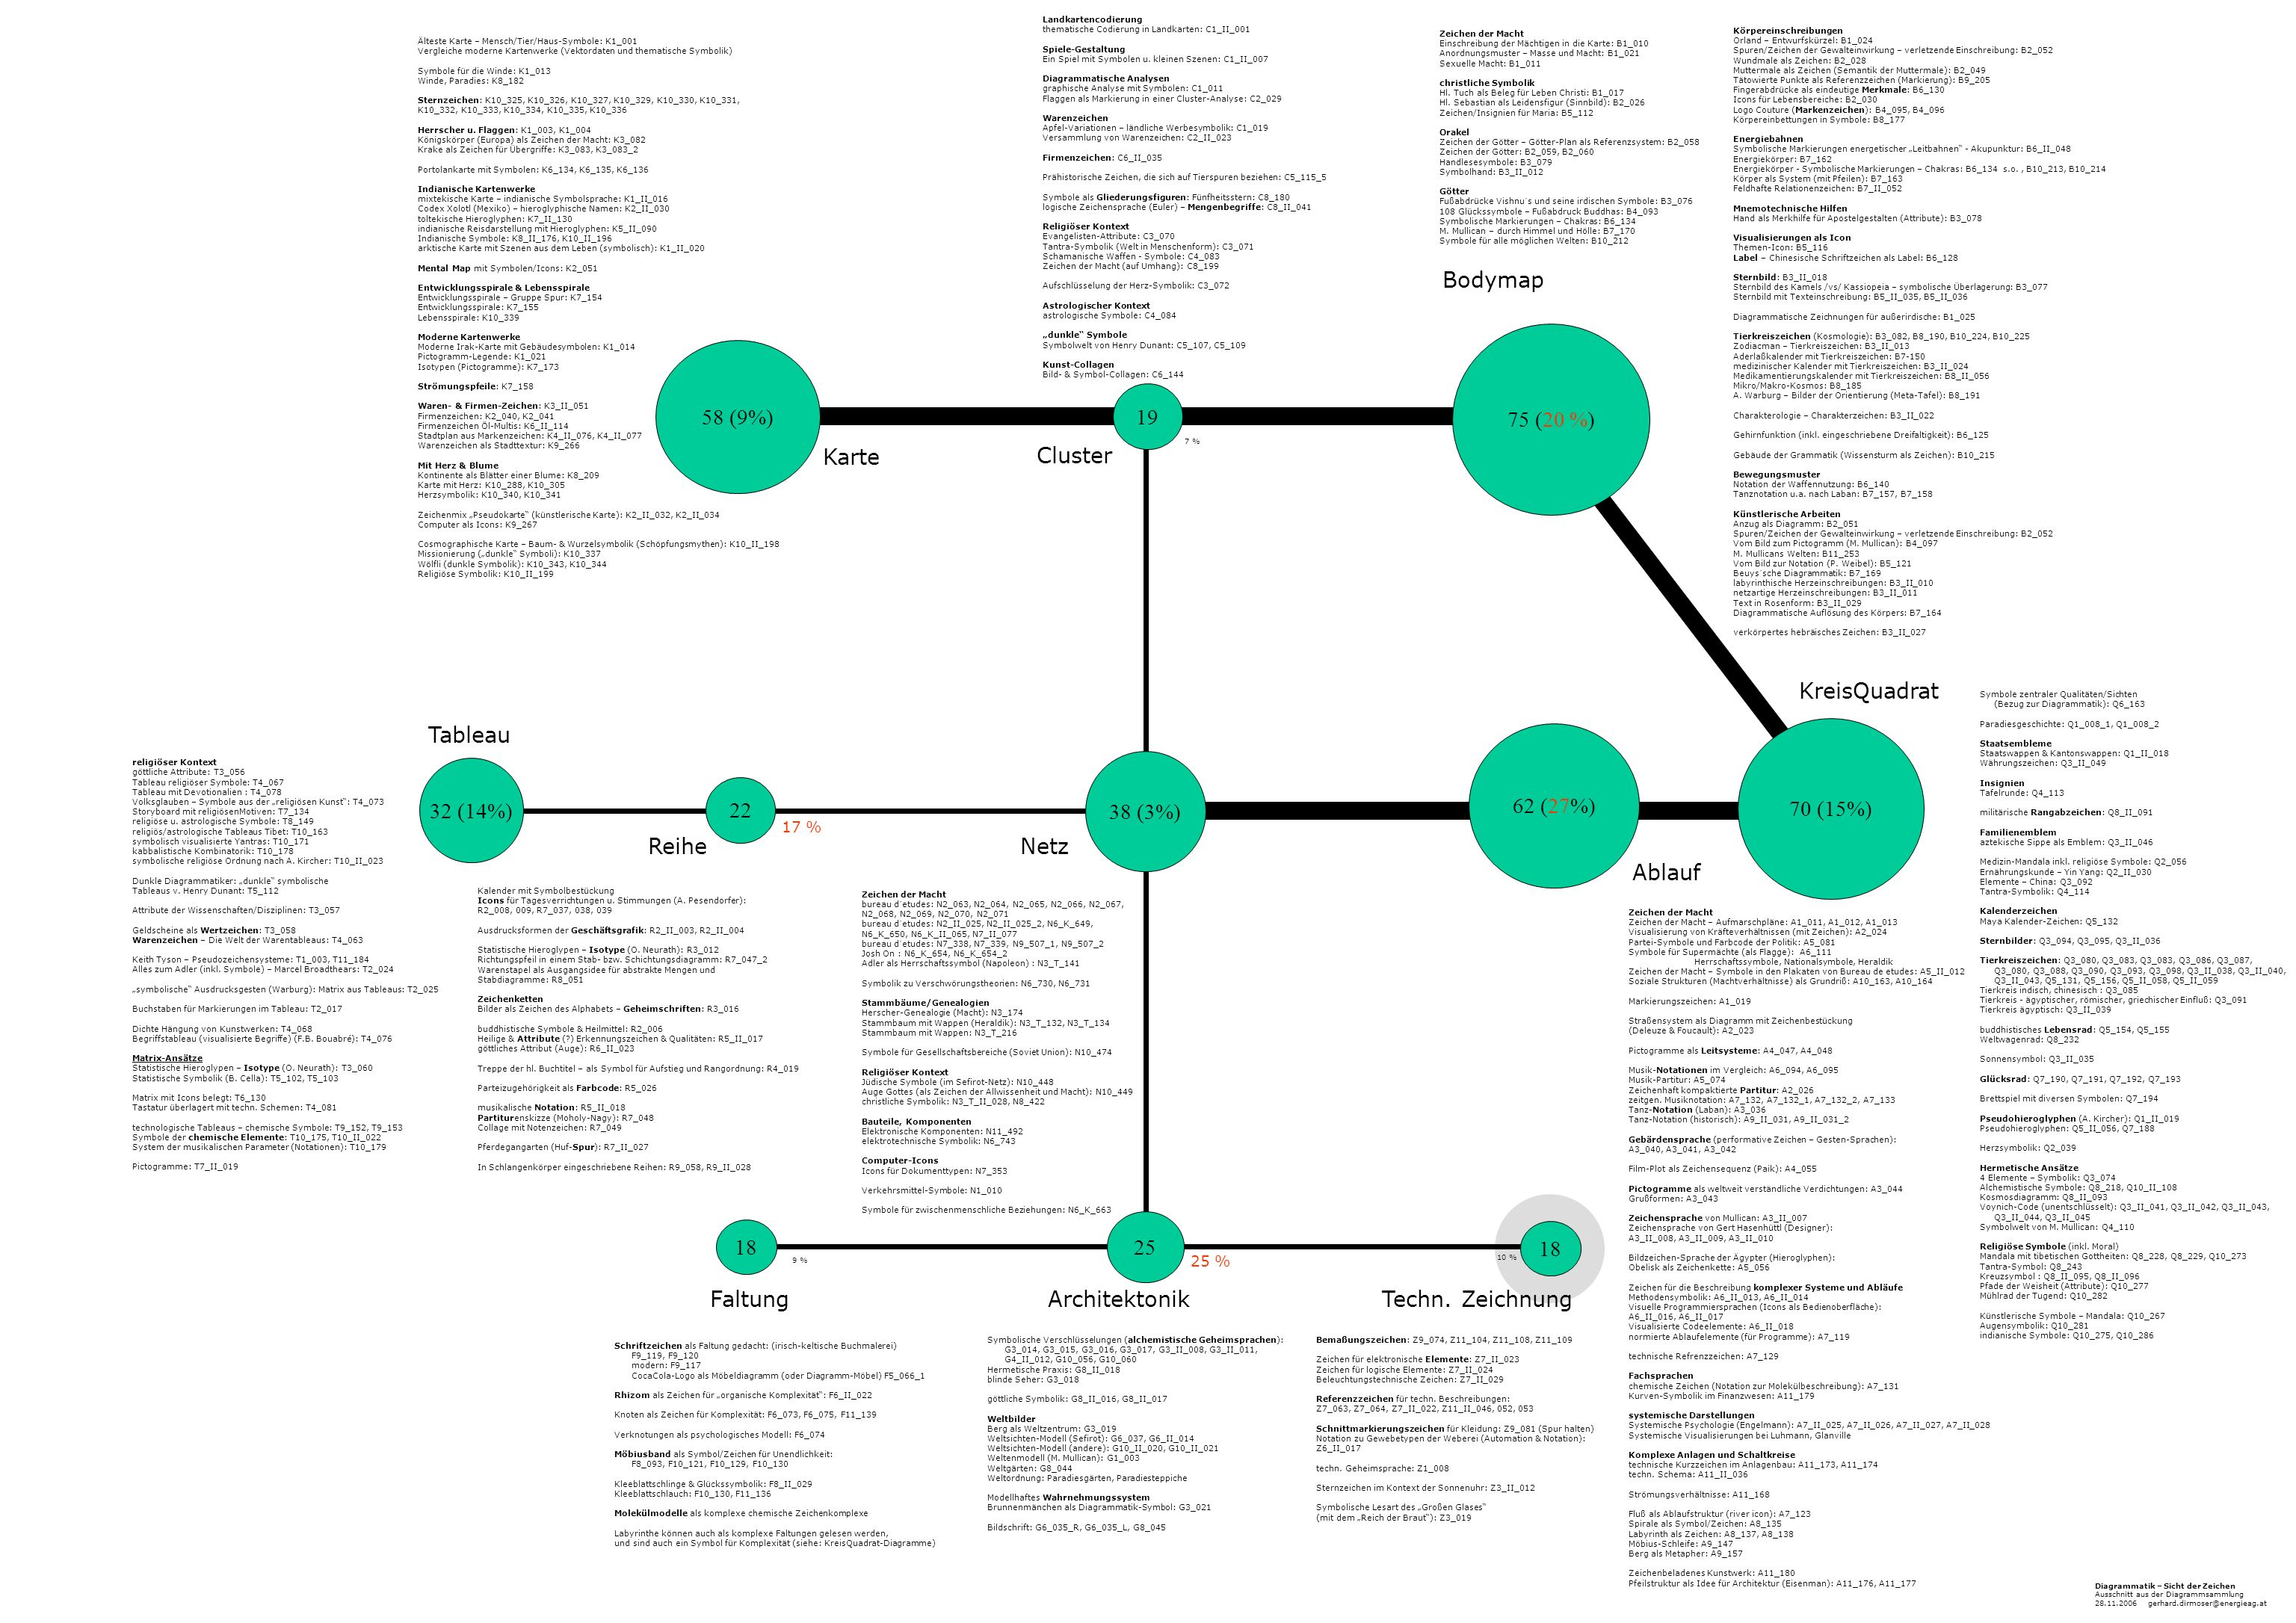 Bodymap 75 (20 %) 58 (9%) 19 Karte Cluster KreisQuadrat Tableau